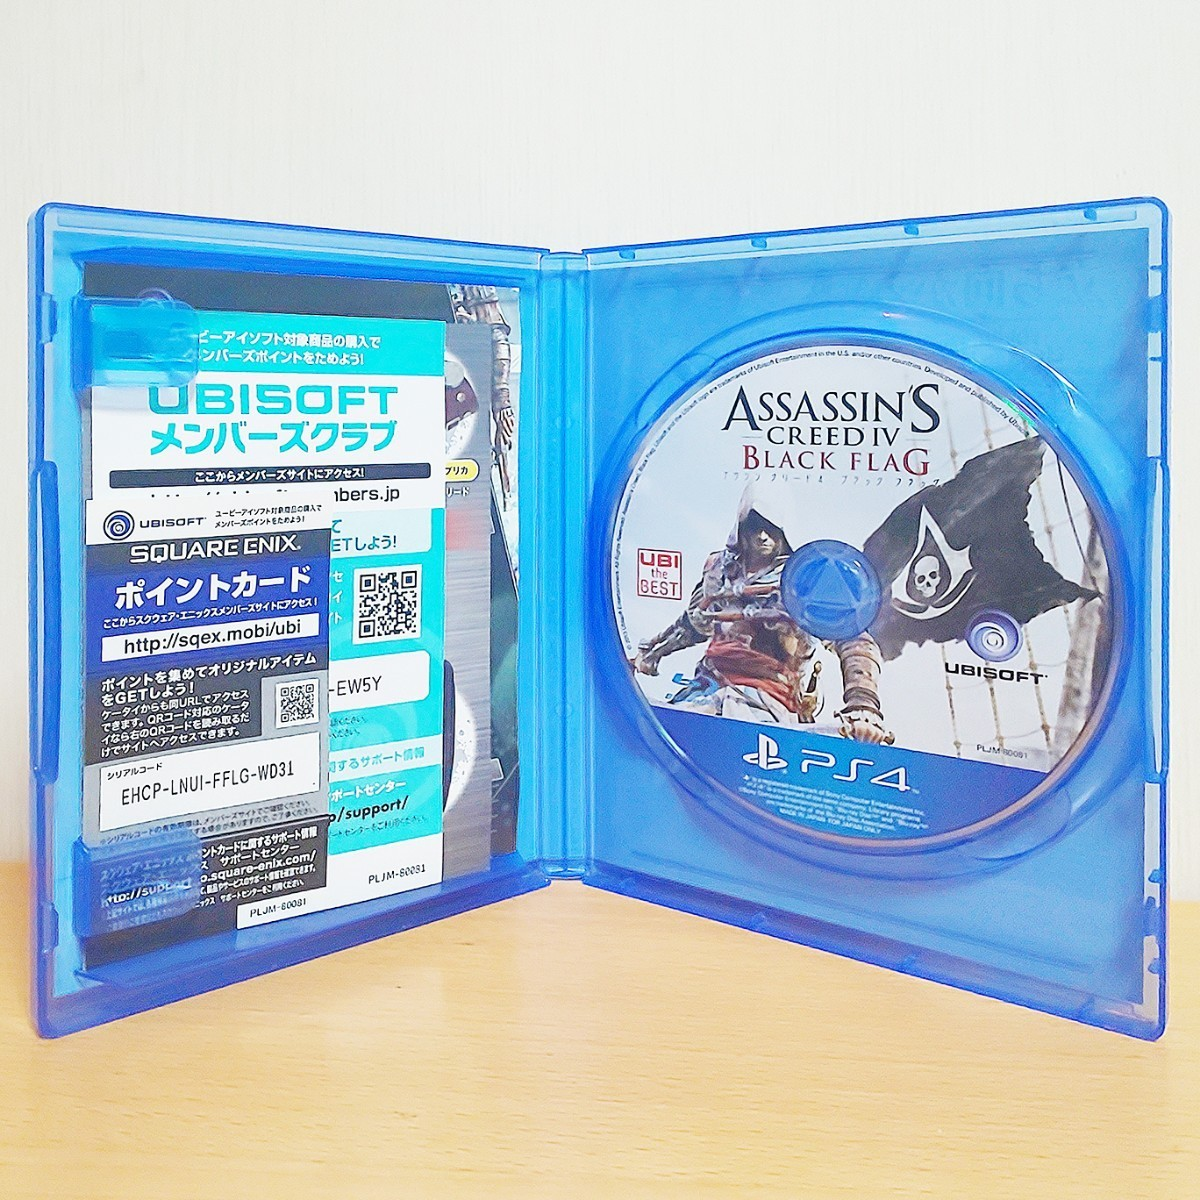 Assassin's Creed IV アサシン クリード 4 ブラック フラッグ PS4 ソフト